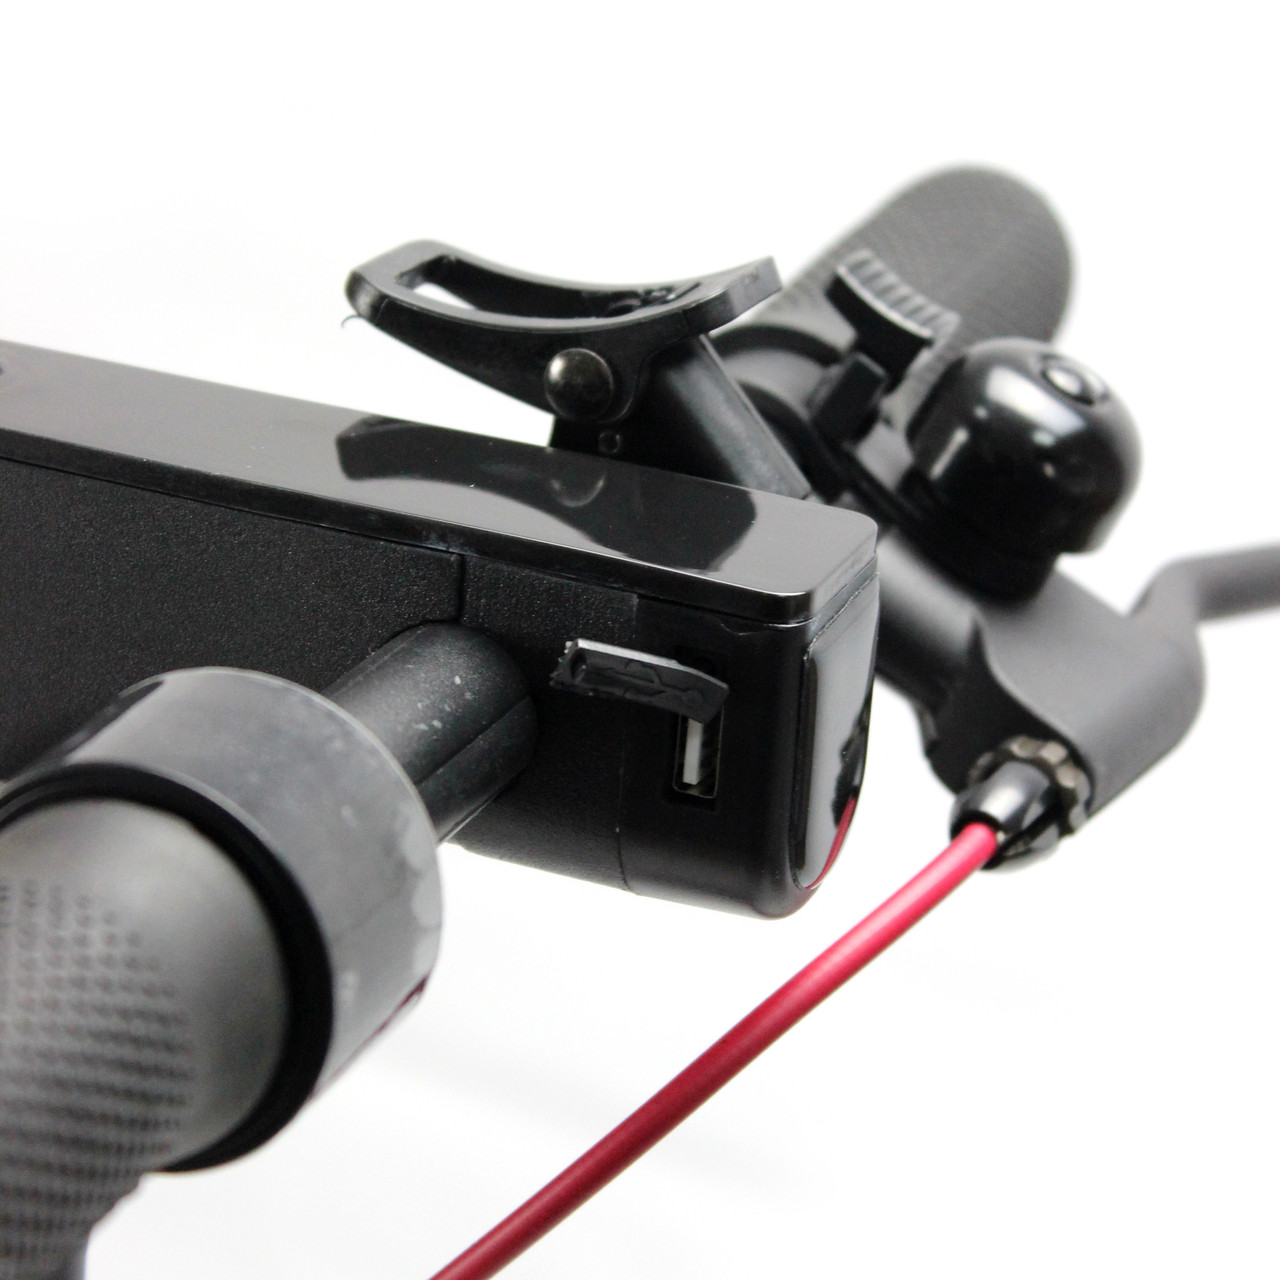 USB роз'єм для зарядки телефону на Електросамокат Crosser E9 MAX